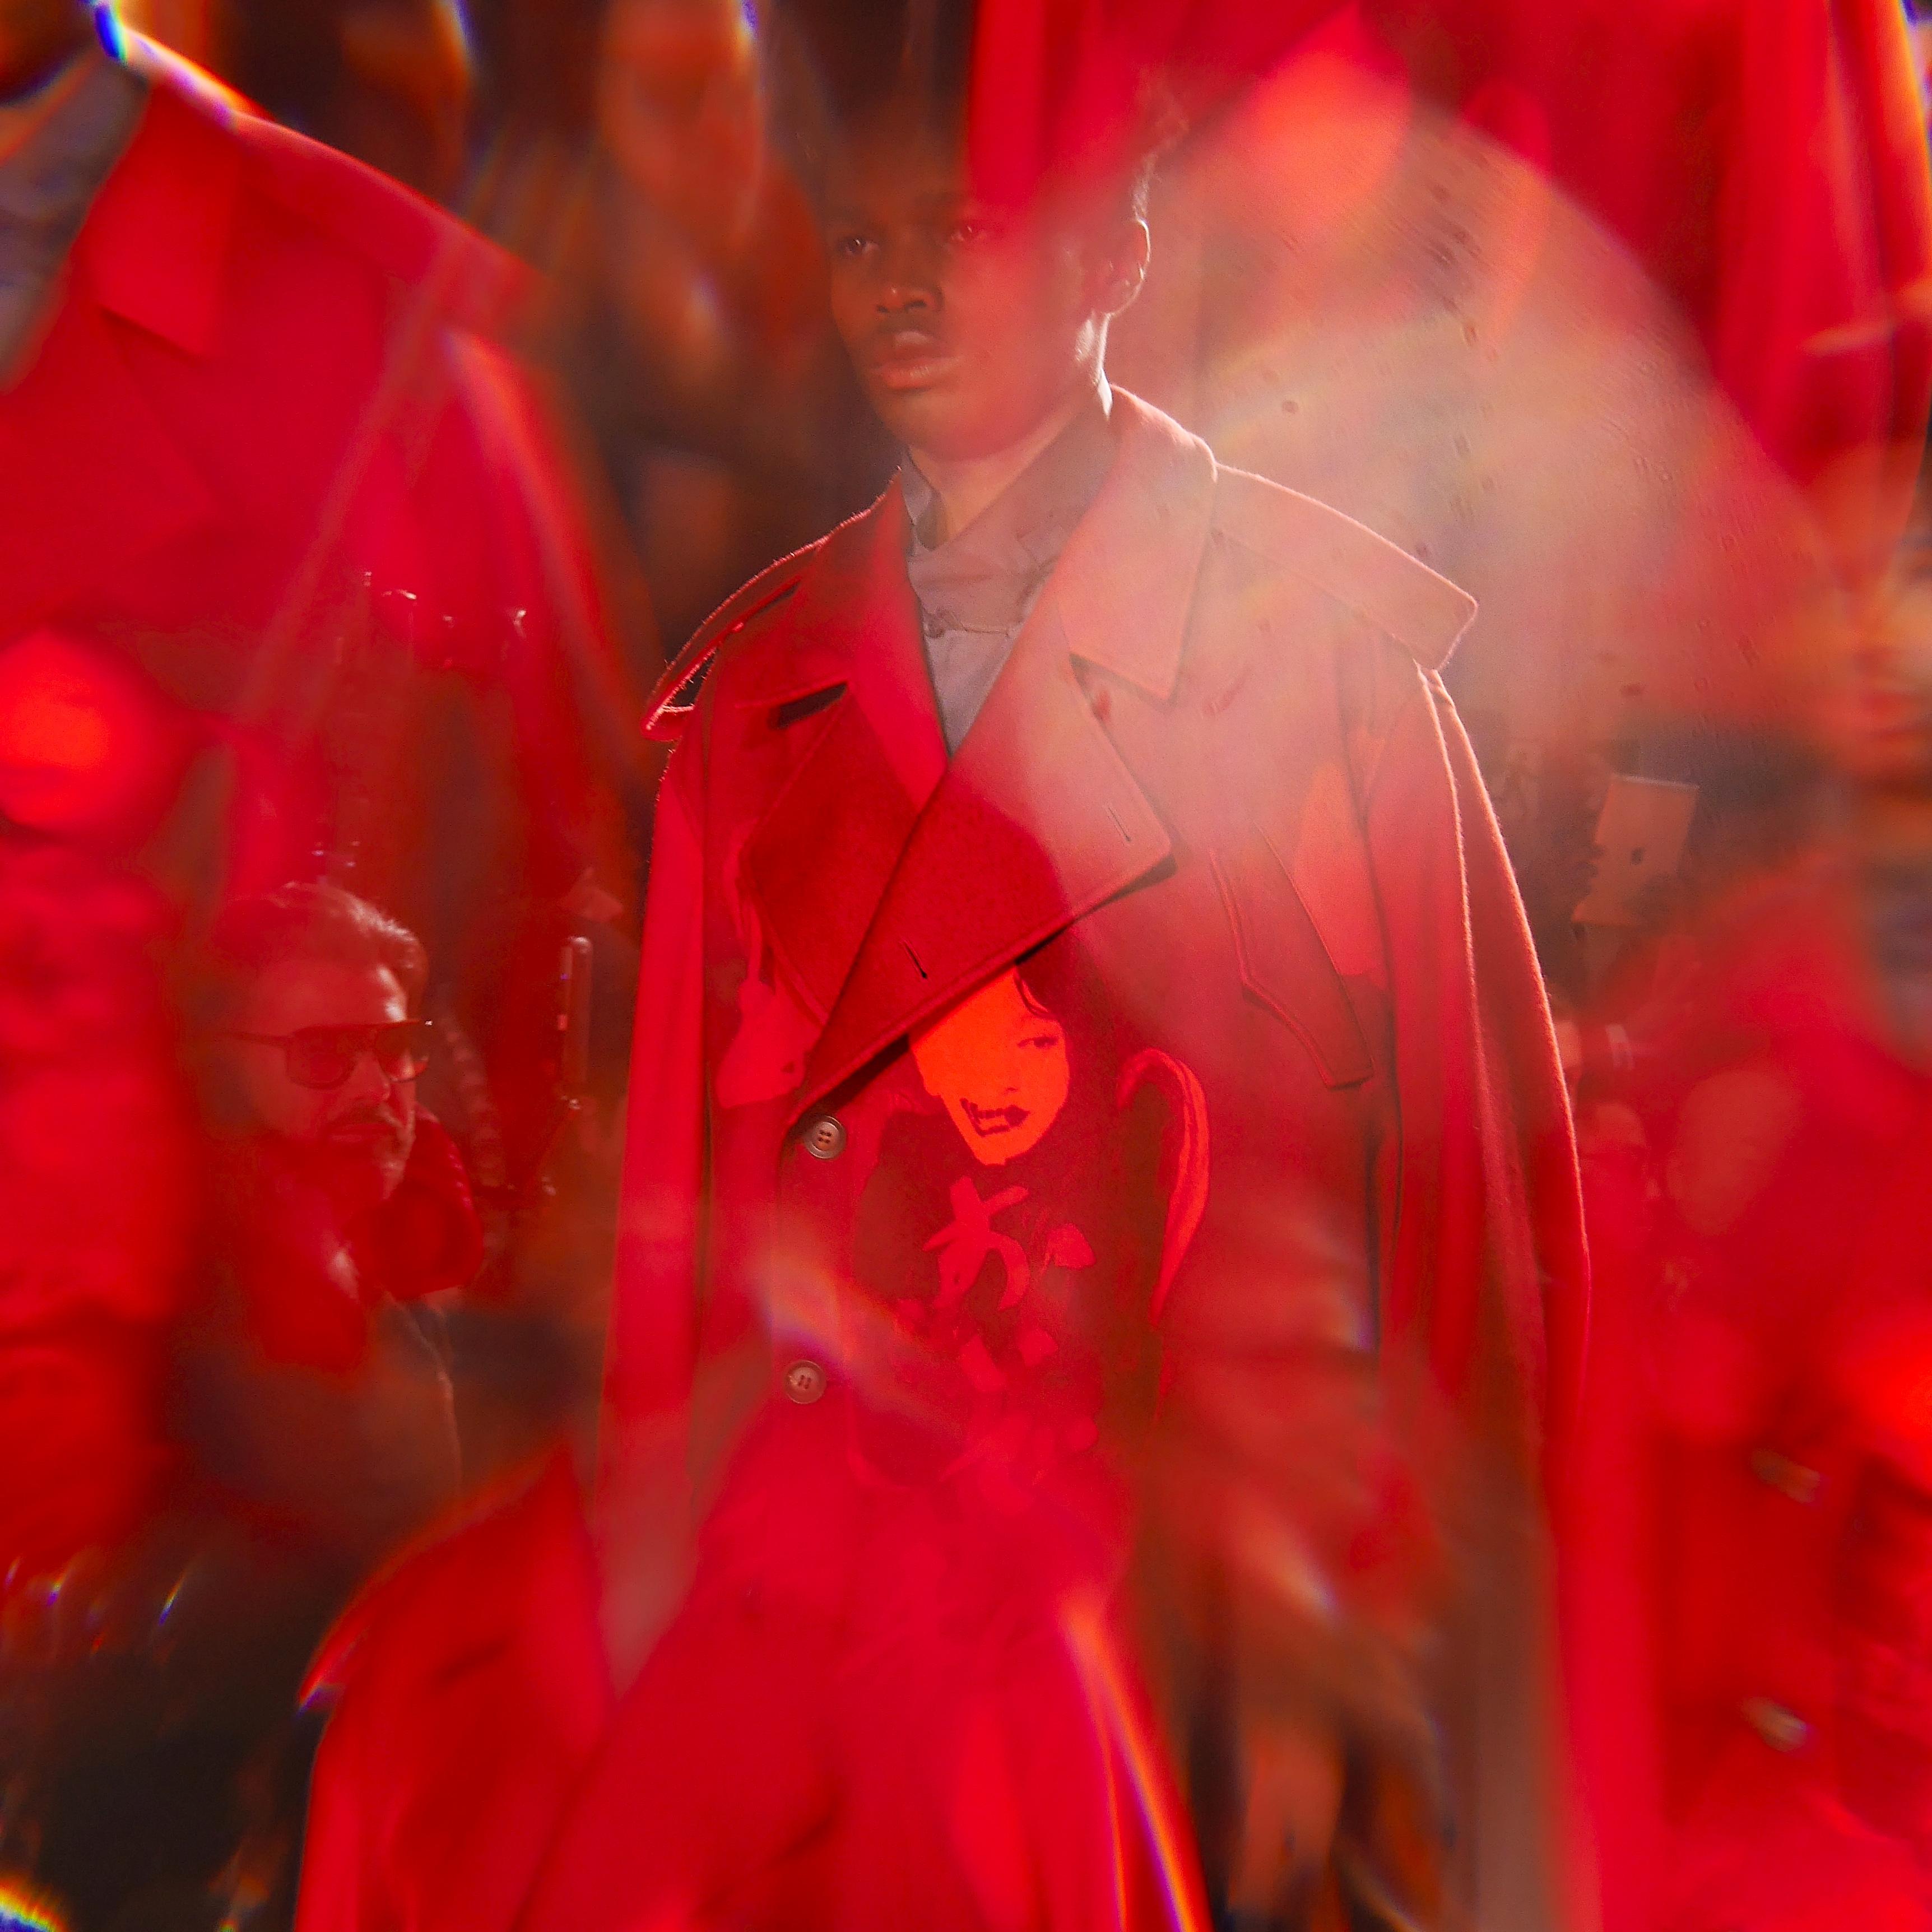 YOHJI YAMAMOTO MEN'S A/W 2018 – A VISION BY FRANK PERRIN